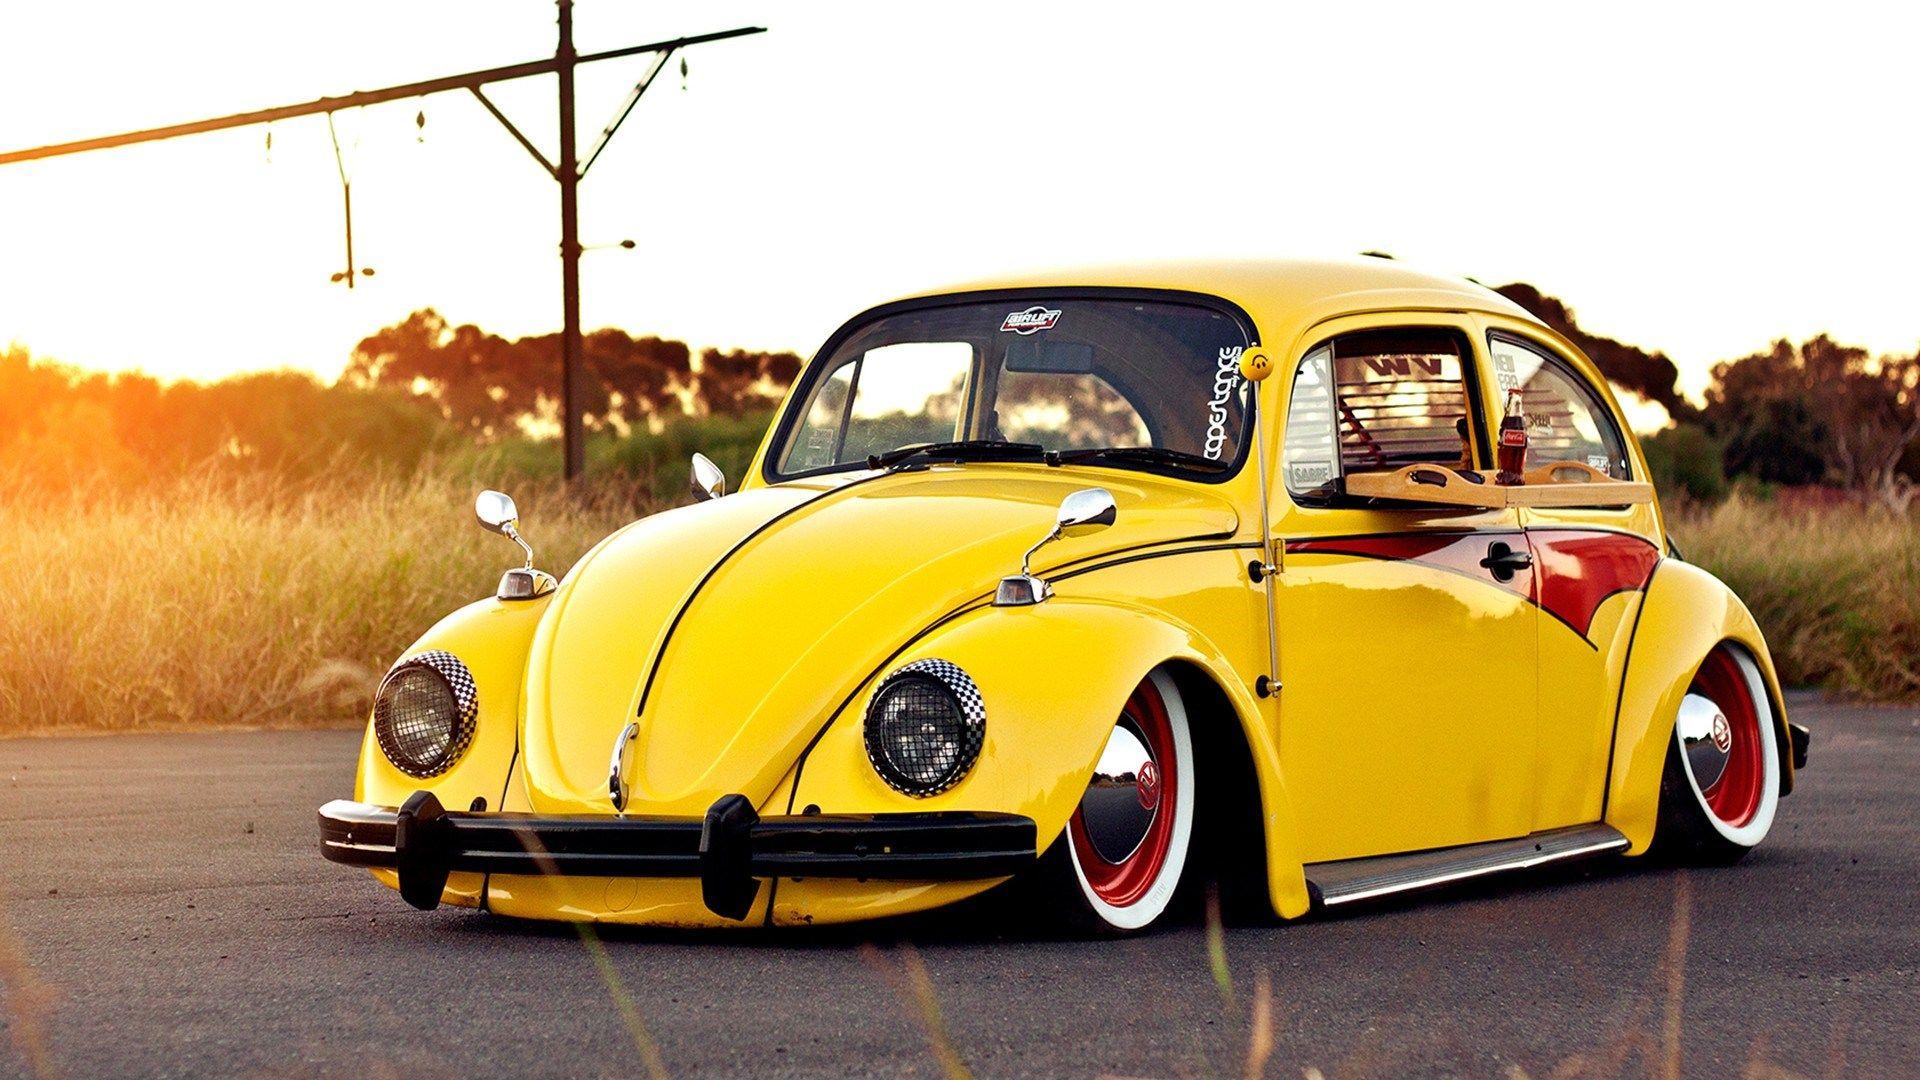 yellow tuned volkswagen beetle sunny day hd wallpaper zoomwalls vw pinterest beetles